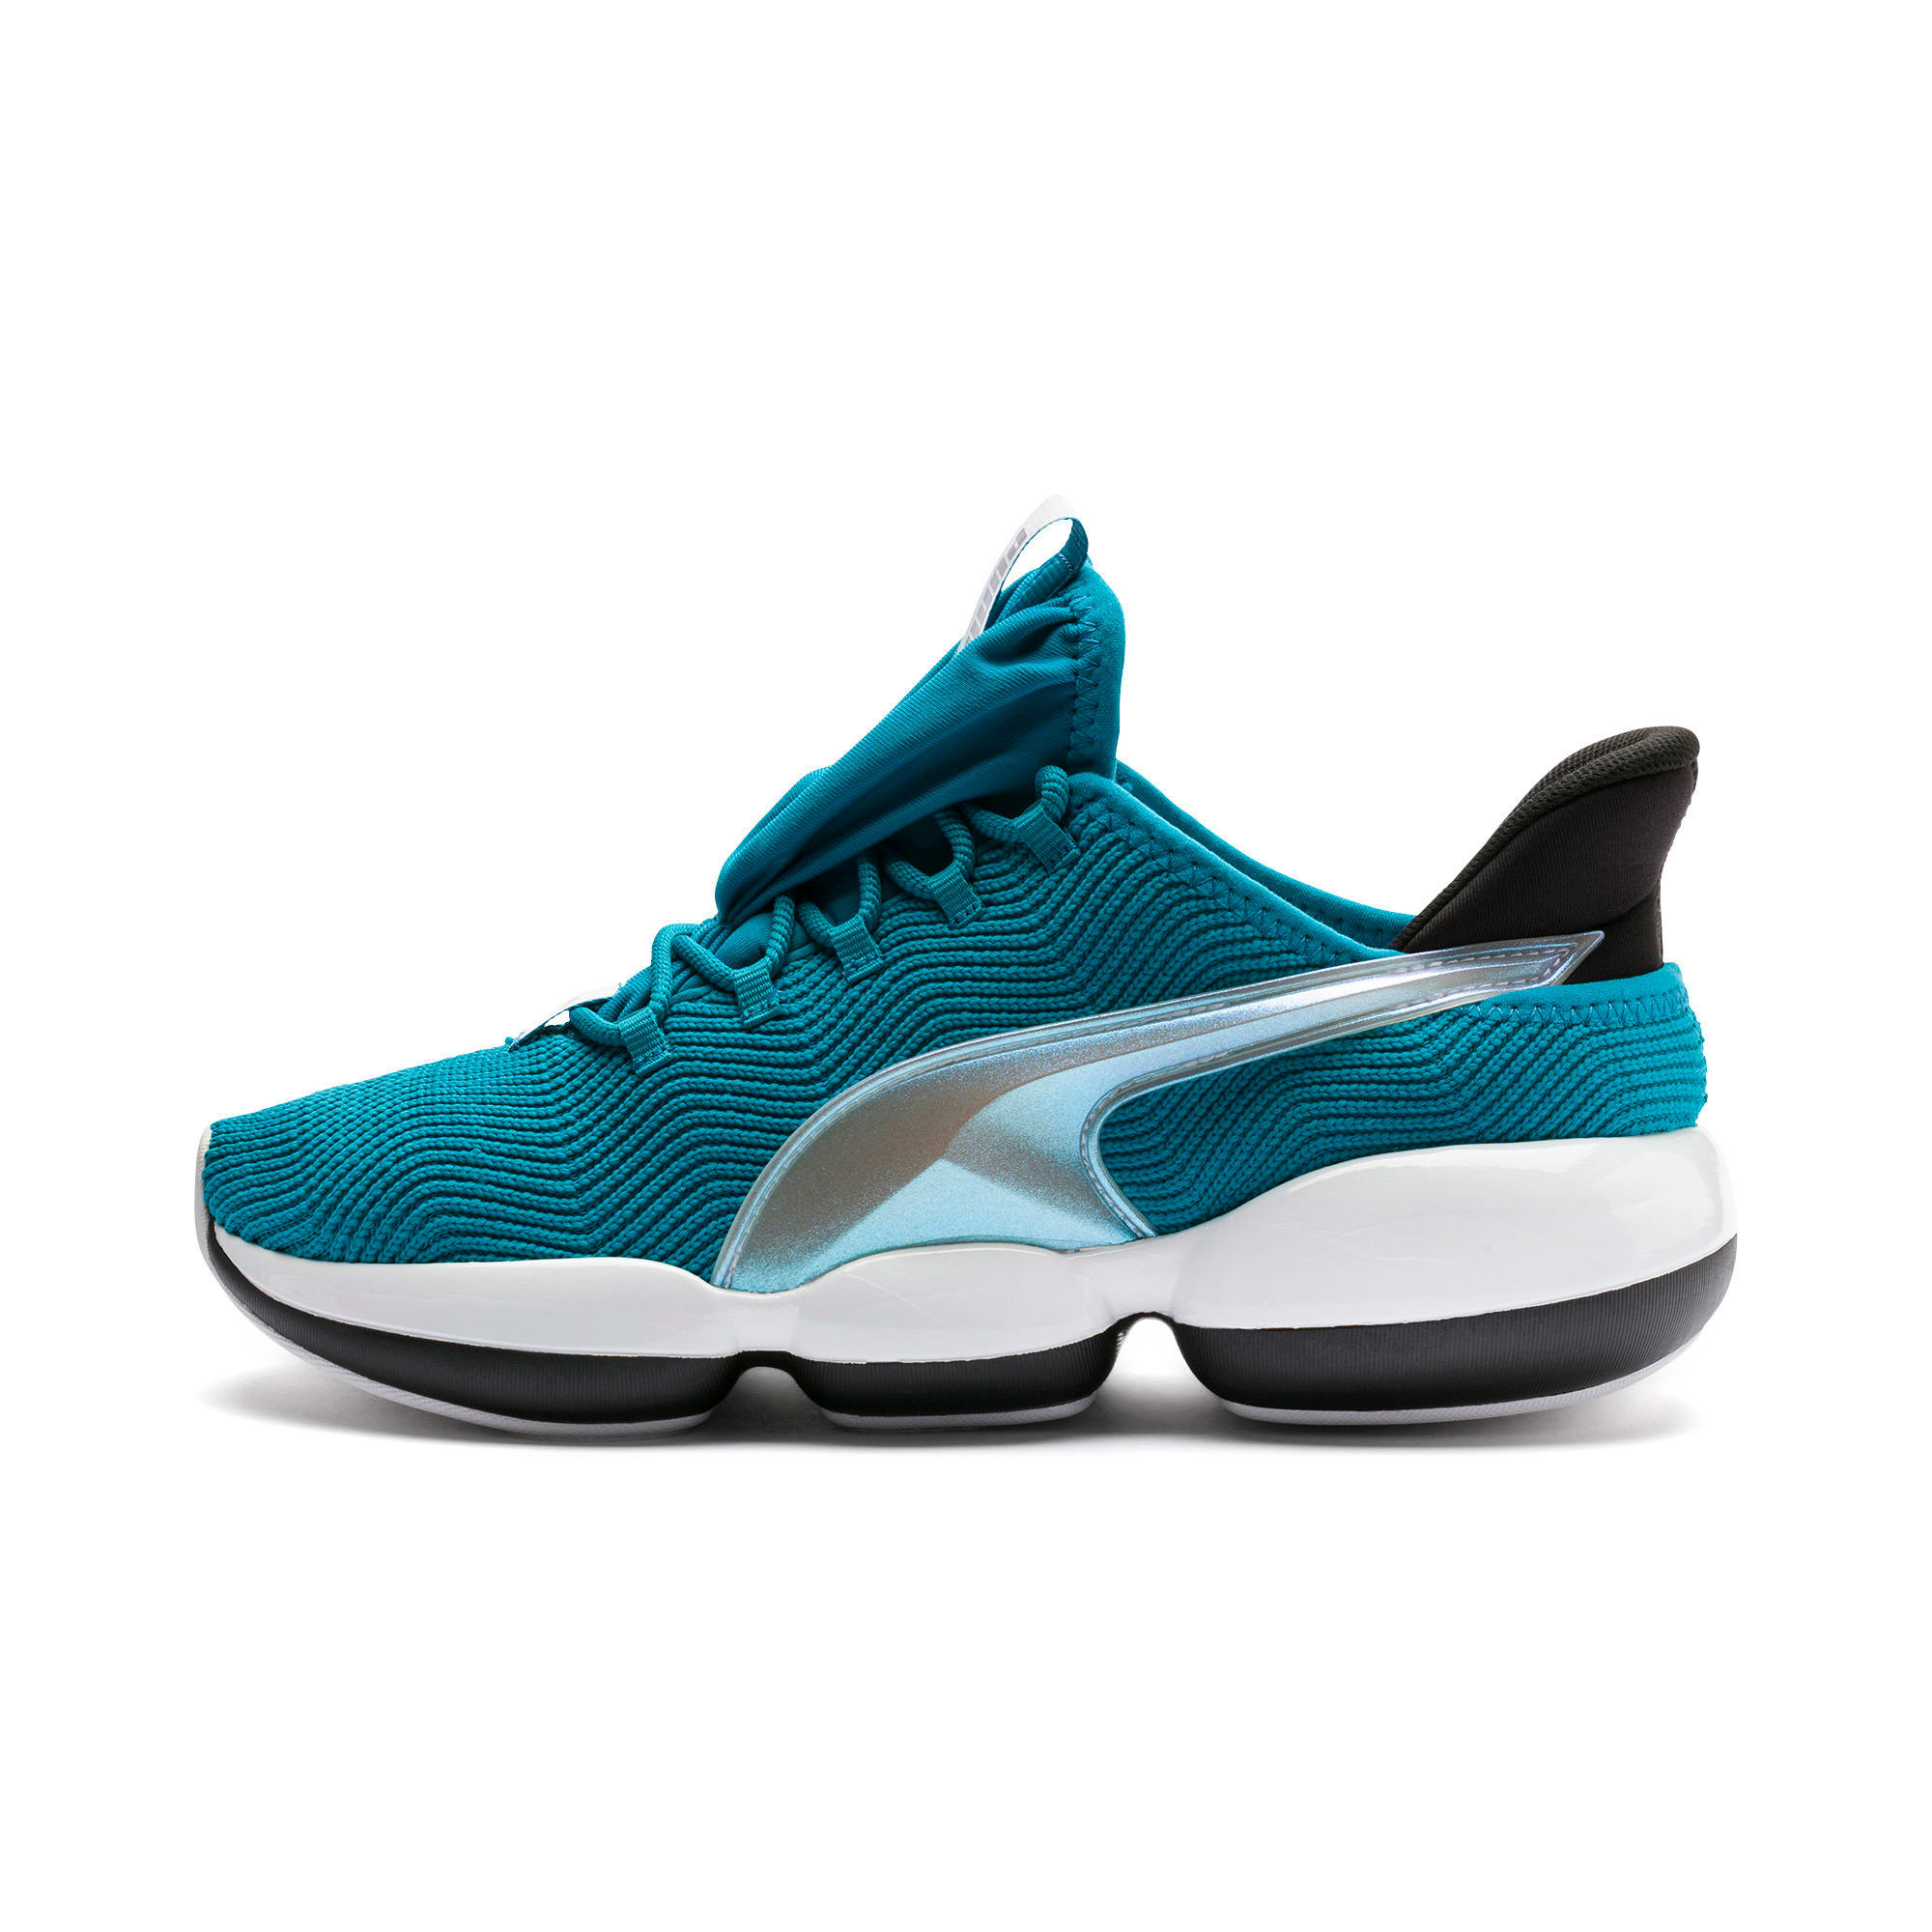 Thumbnail 1 of Mode XT Trailblazer Iridescent Women's Training Shoes, Caribbean Sea-Puma White, medium